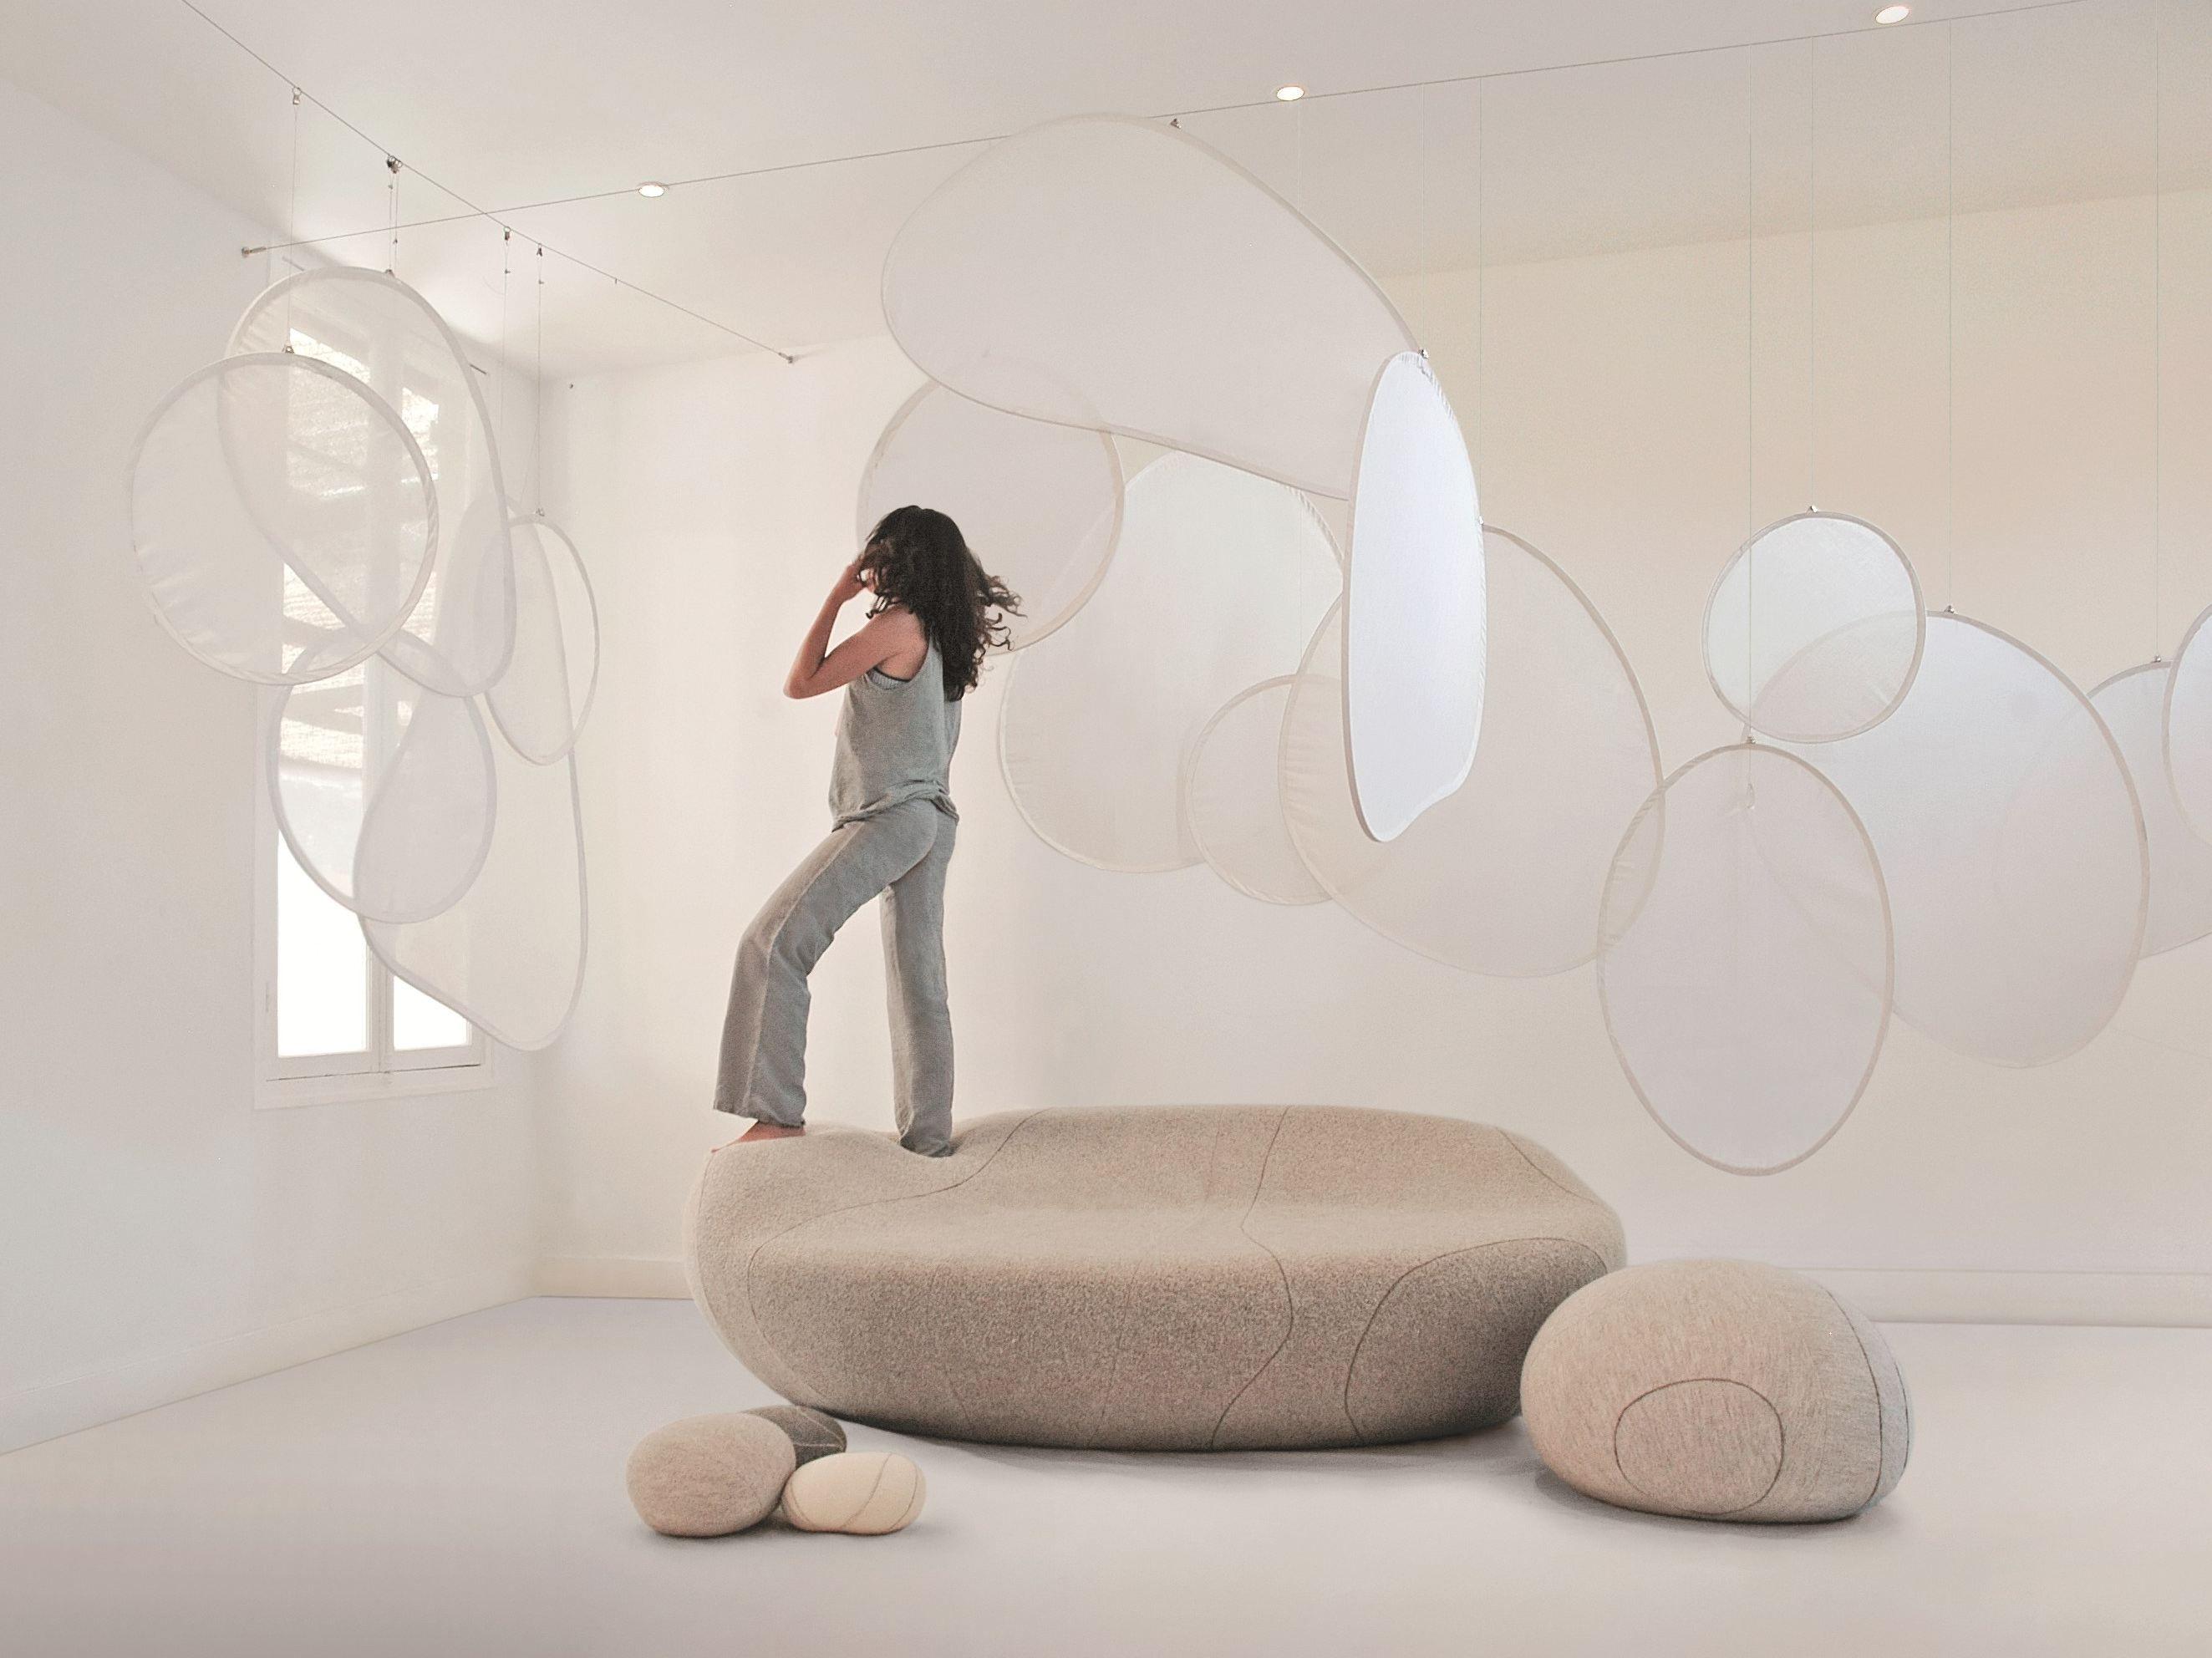 Fabric room divider mobileshadows by smarin design stéphanie marin